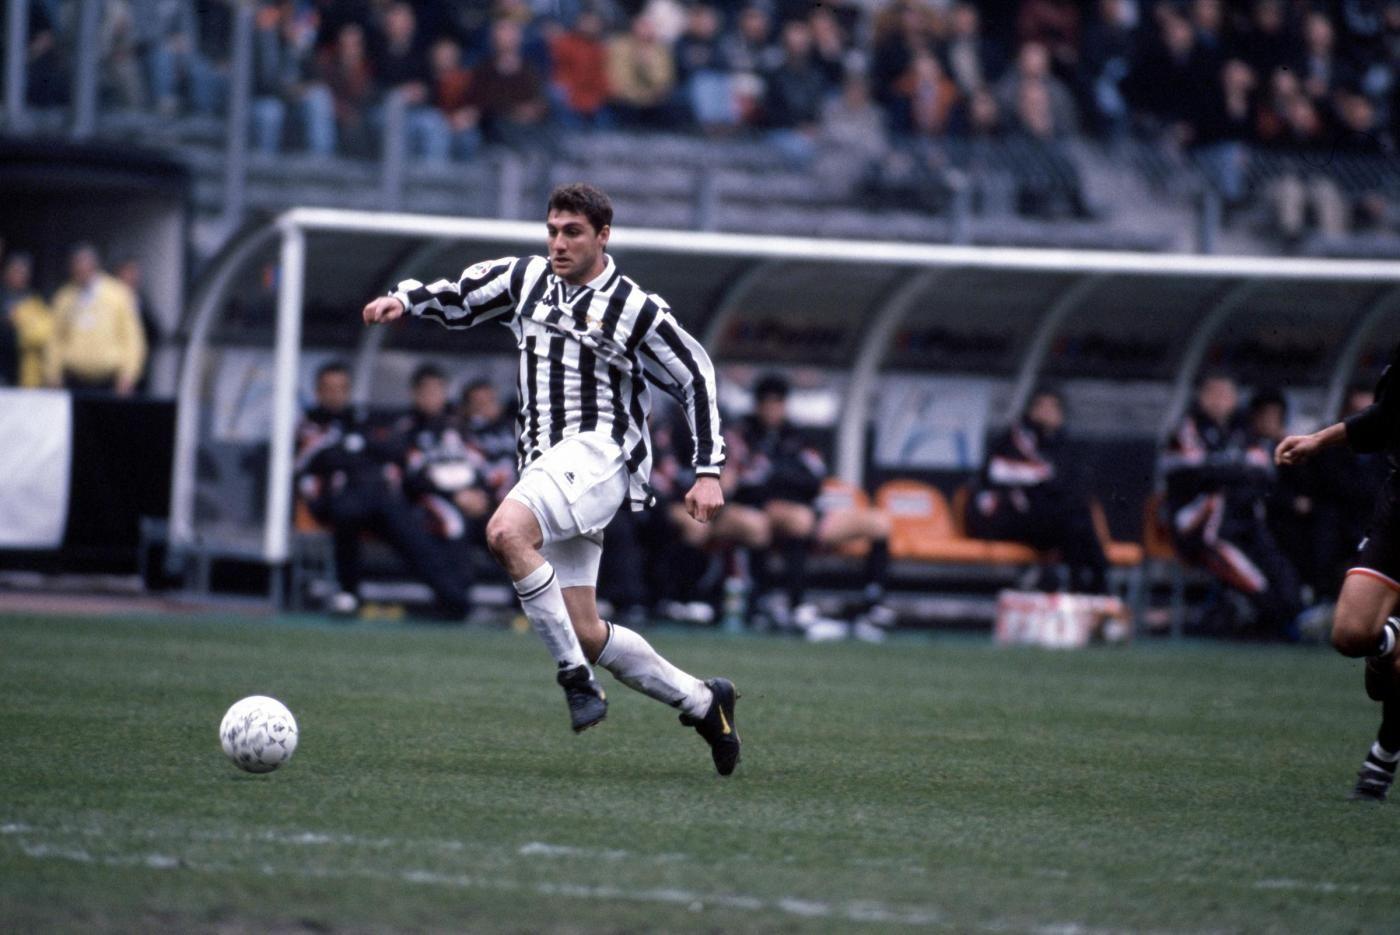 Christian Vieri Juventus fut Pinterest